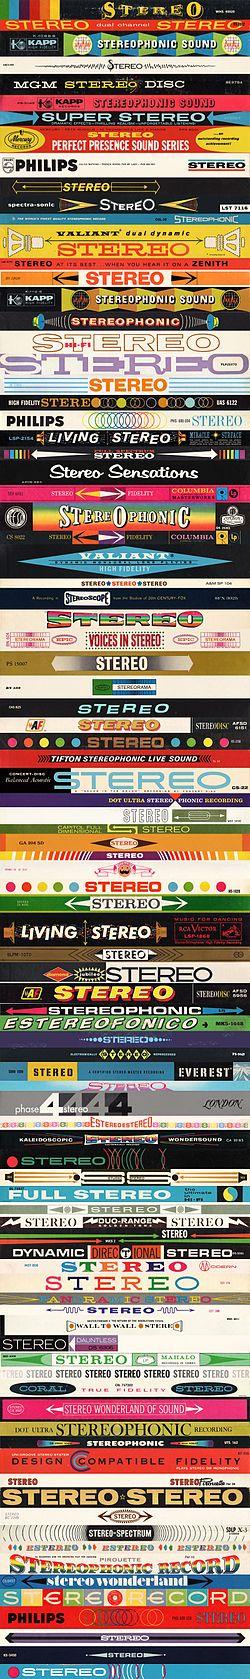 Stereophonic sound - Wikipedia